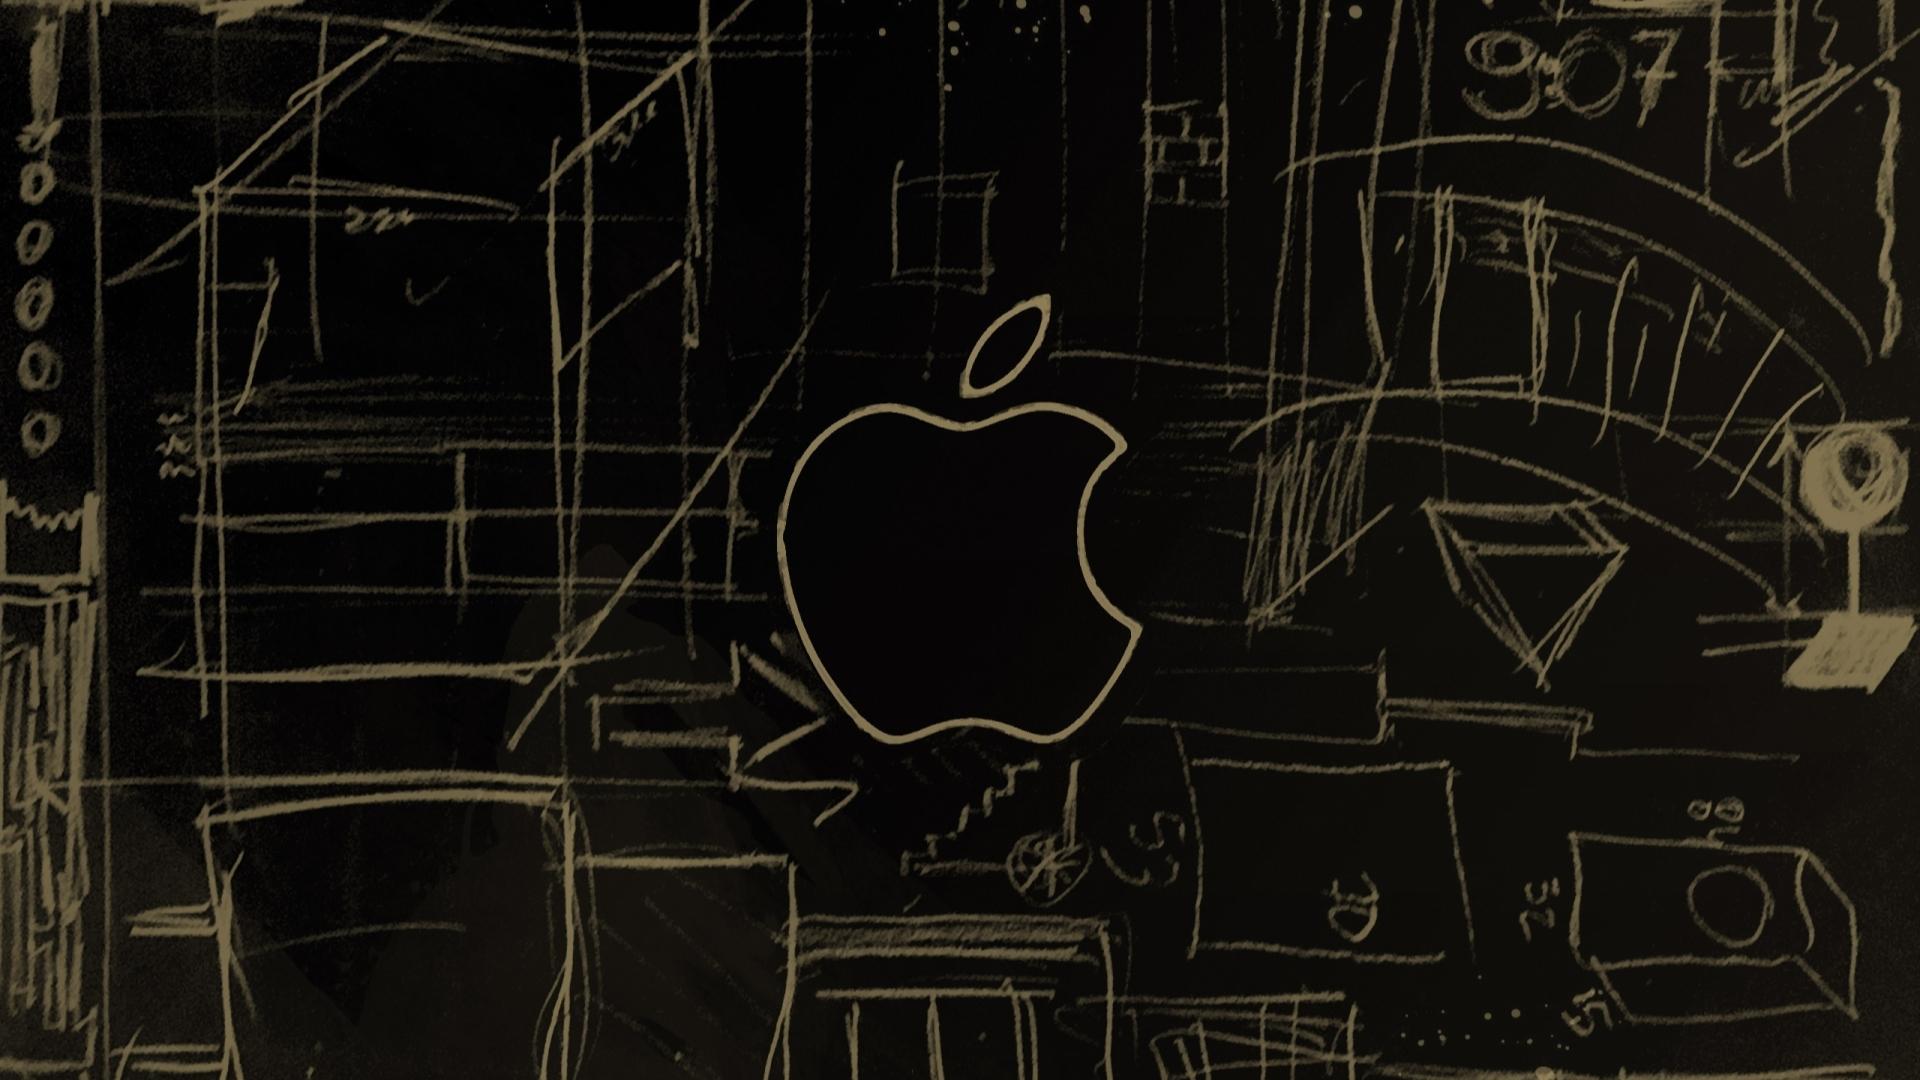 Free Download Mac1 7picture Naver 1920x1080 For Your Desktop Mobile Tablet Explore 68 Apple Imac Wallpaper Imac Desktop Wallpaper Apple Imac Wallpapers Hd Imac Retina 5k Wallpaper